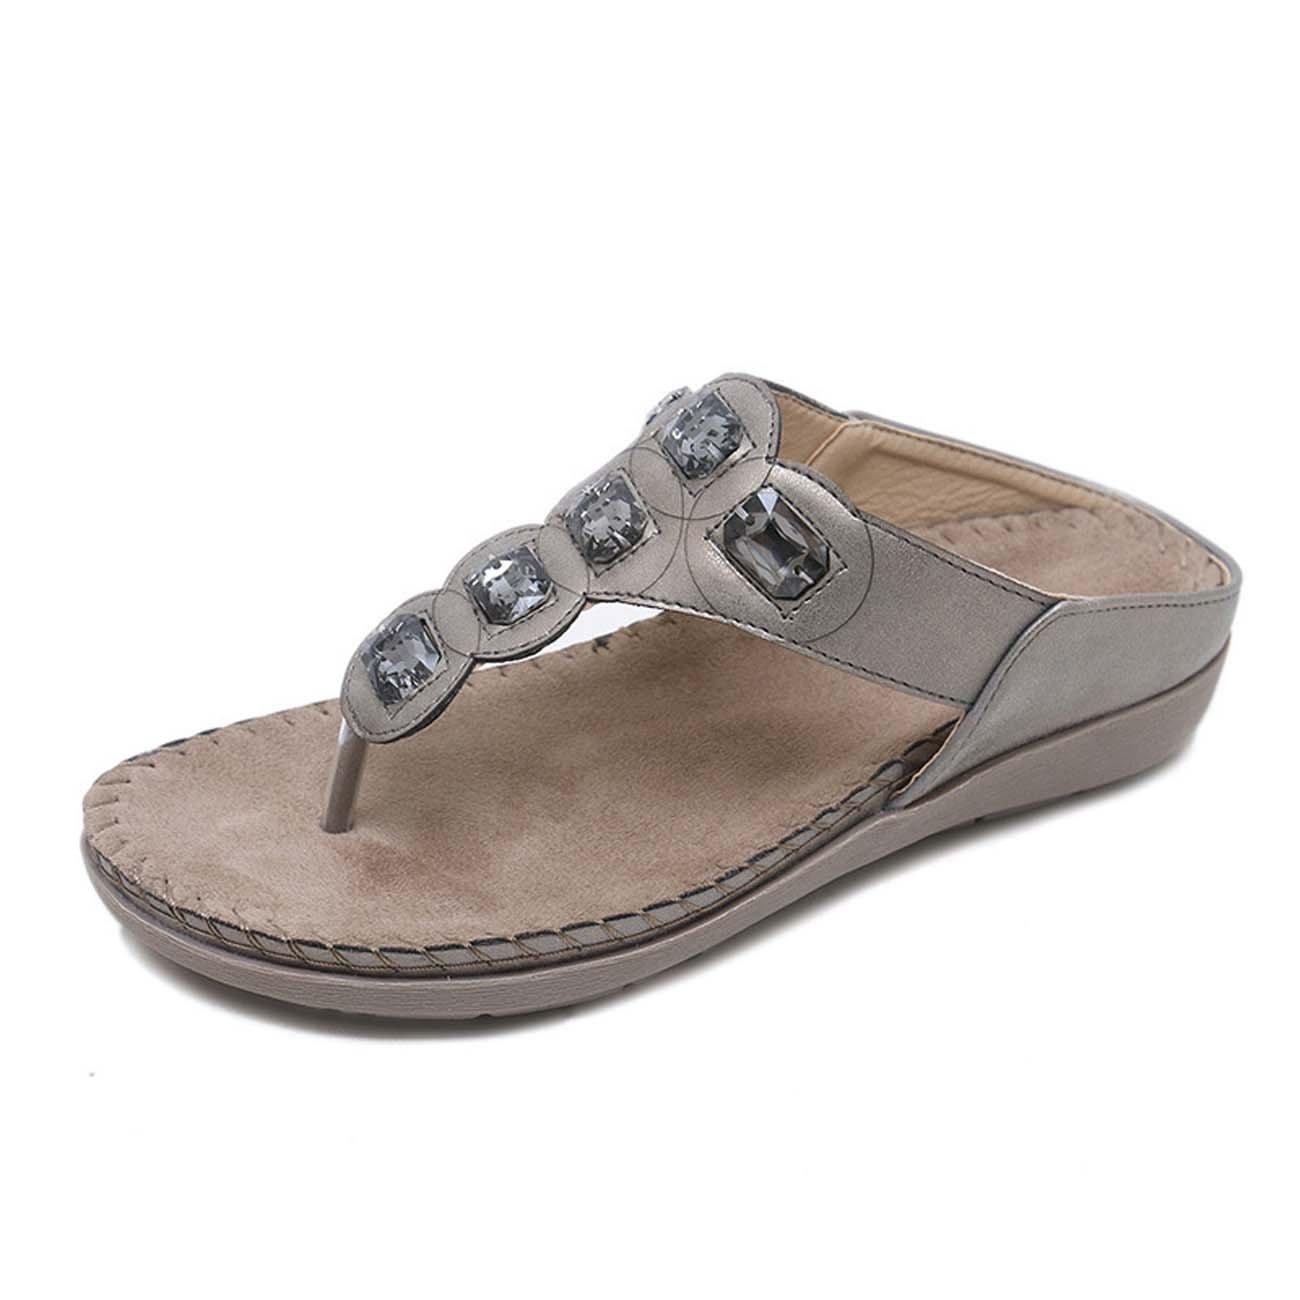 GONGFF Ms Sandals Rhinestone Large Code Zapatos Planos,#2,38 38|#2